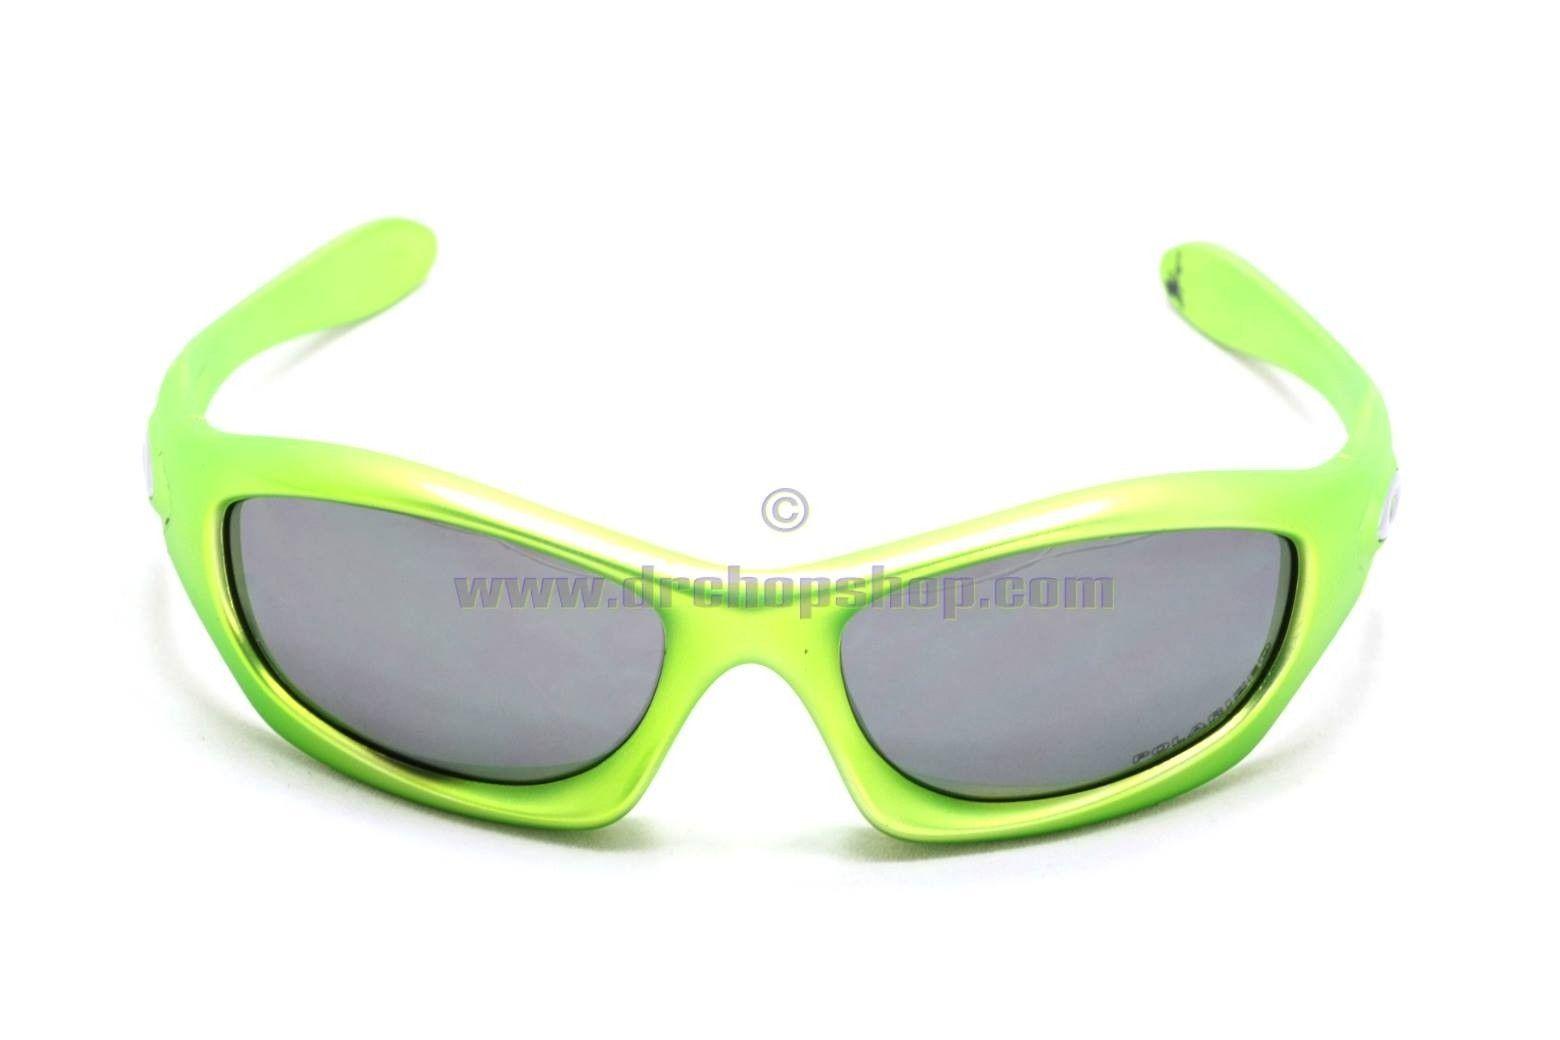 Couple Of Cool Customs - 1093908_660748377270185_1384889070_o.jpg